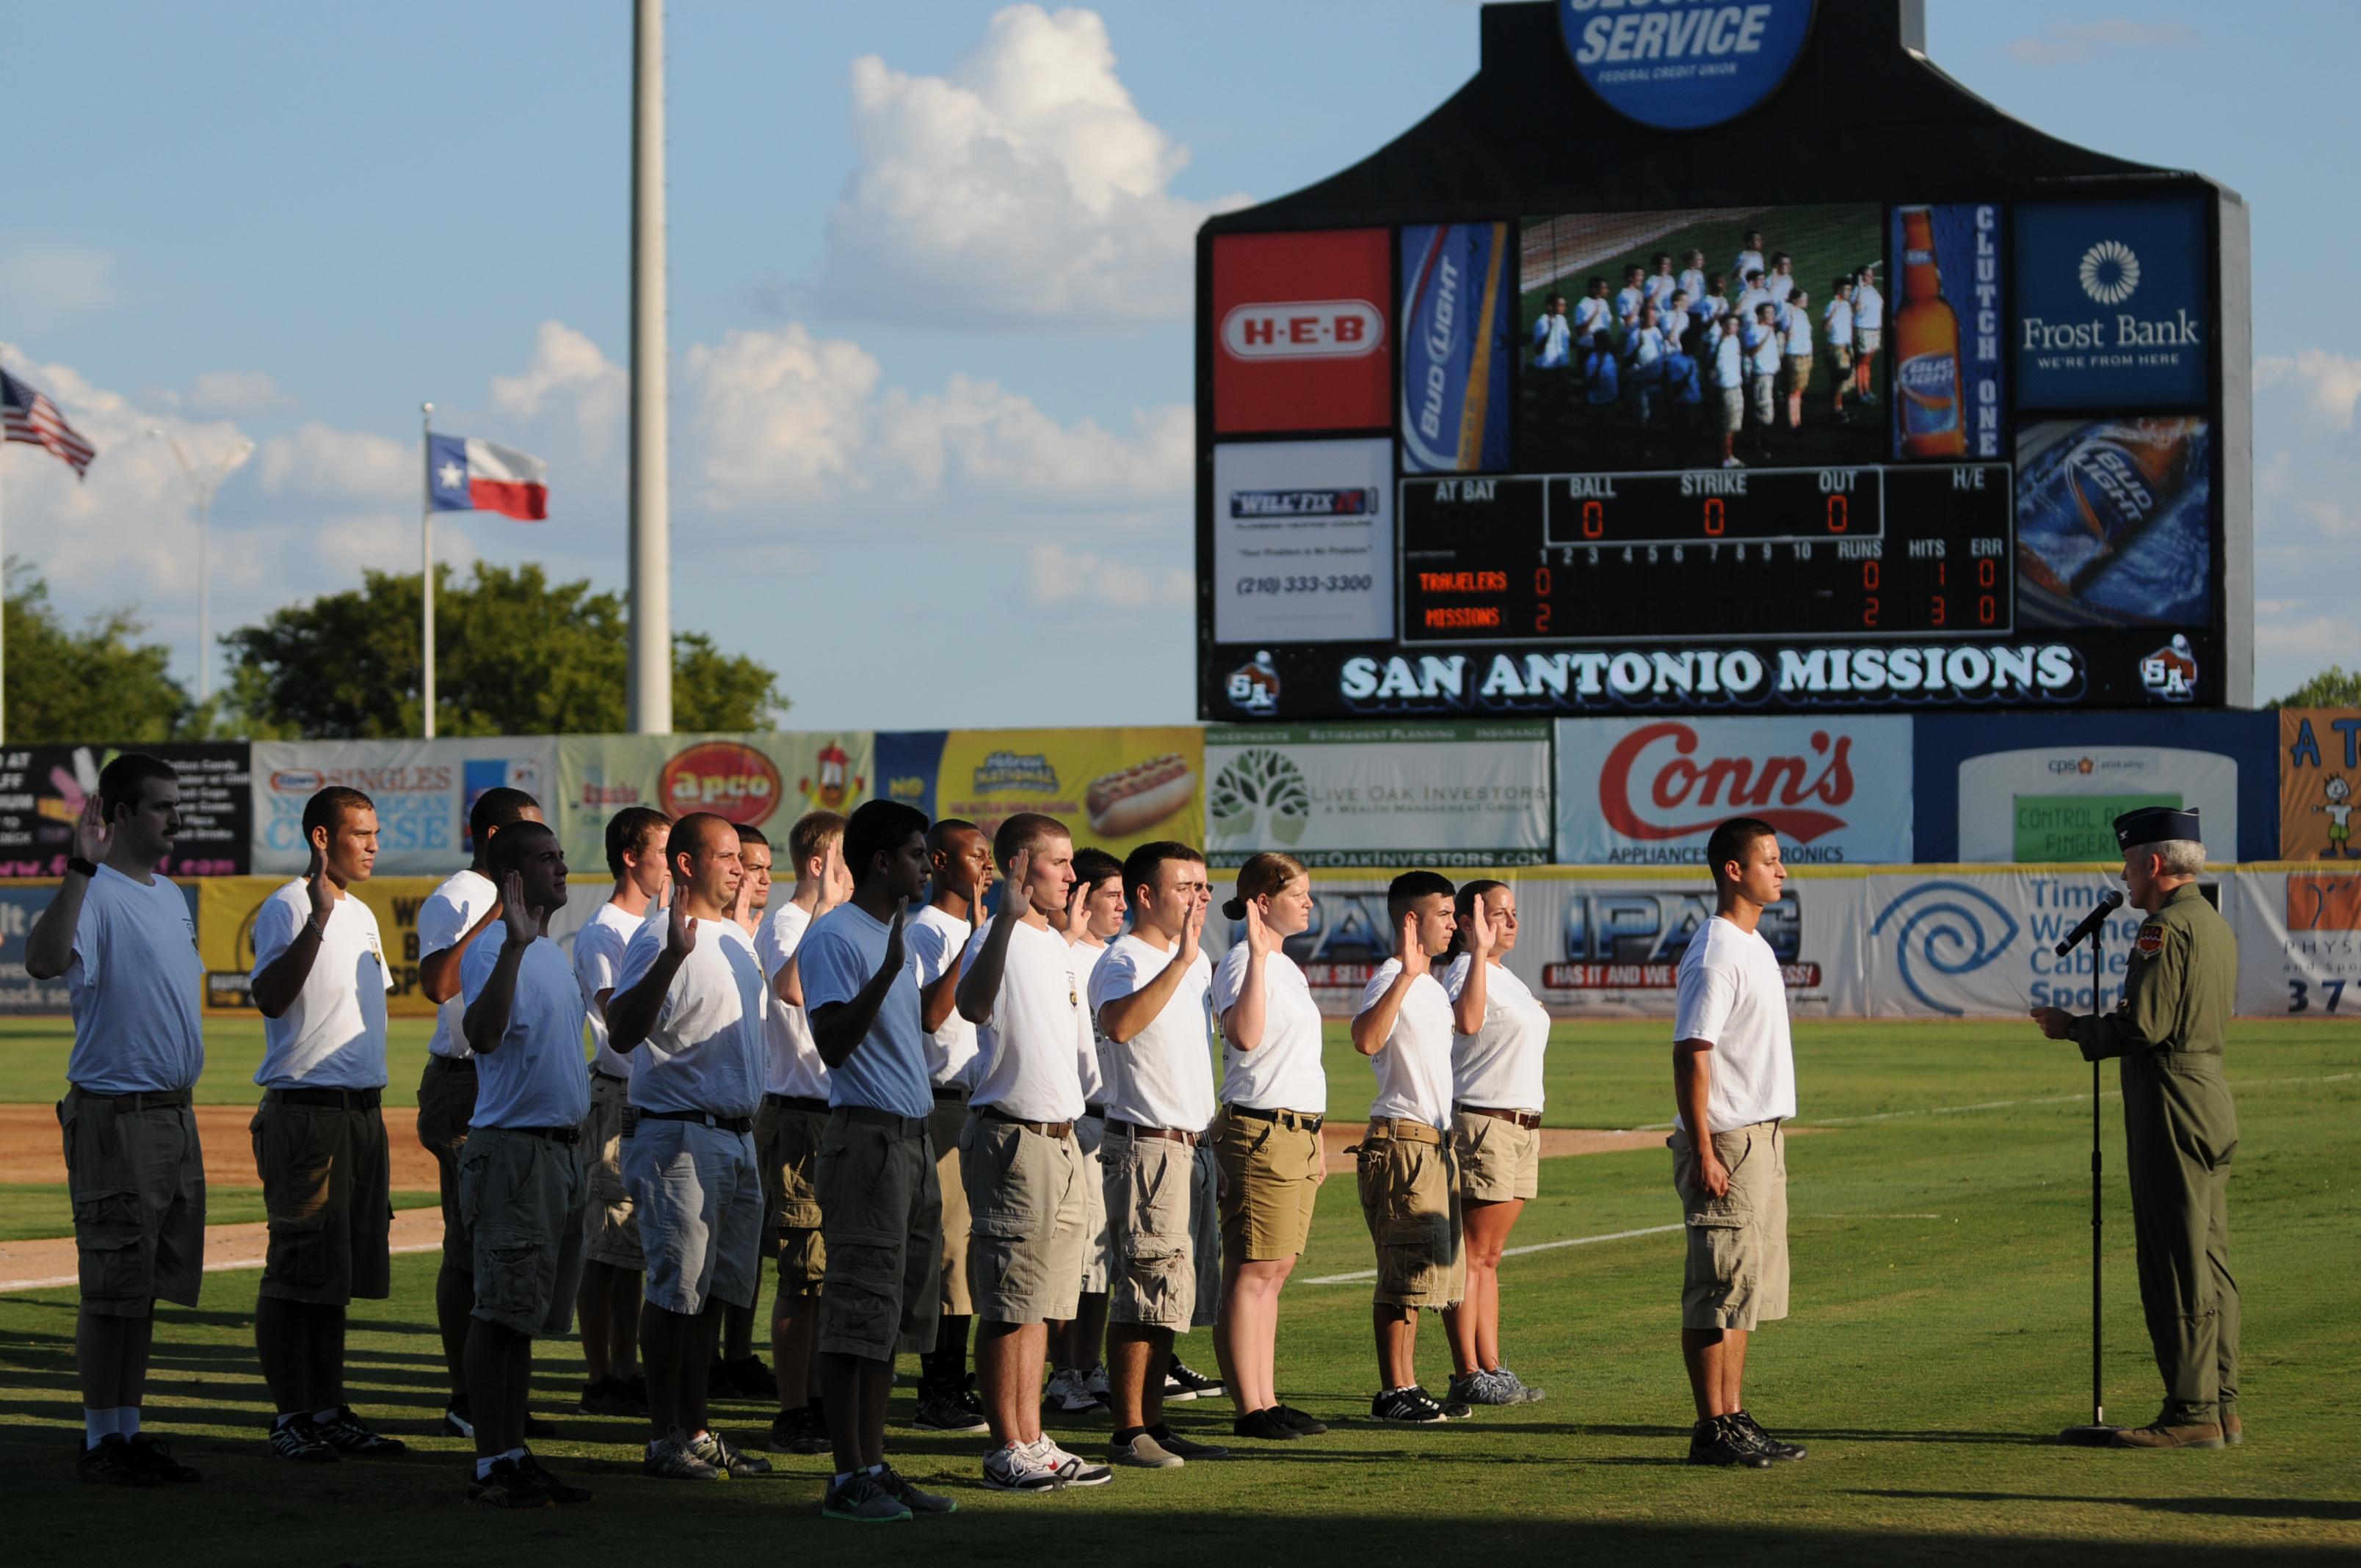 Texas Air Guard honored by San Antonio Missions Baseball Club